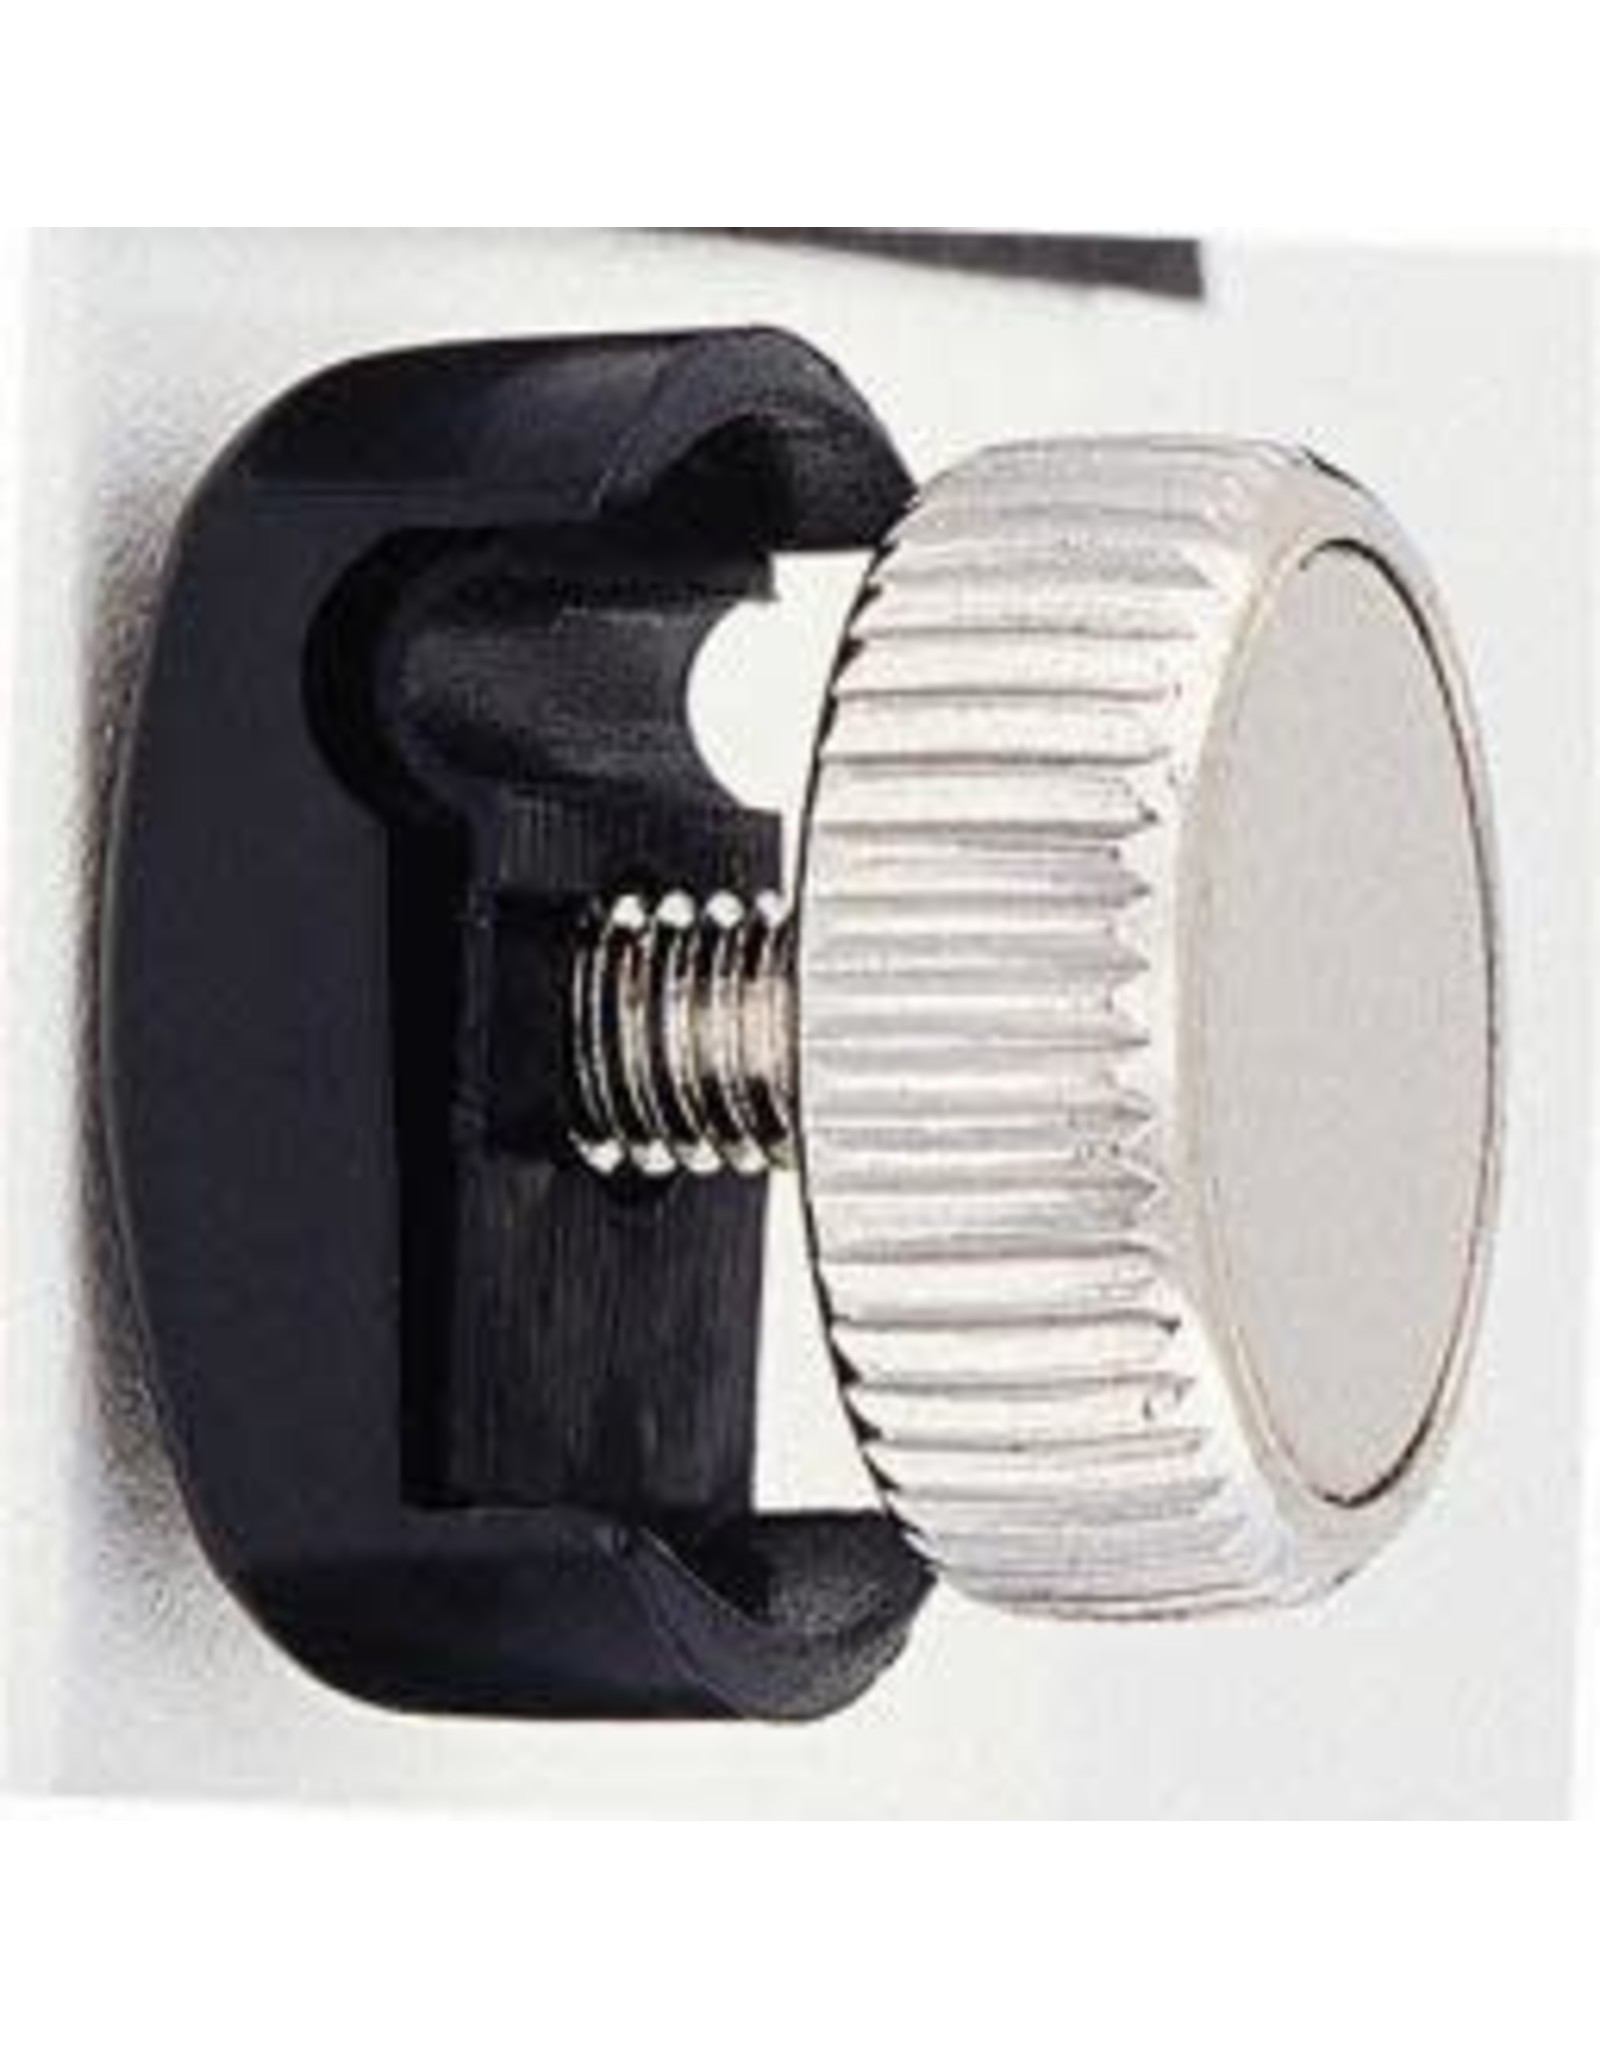 Cateye Cateye Computer Wheel Magnet